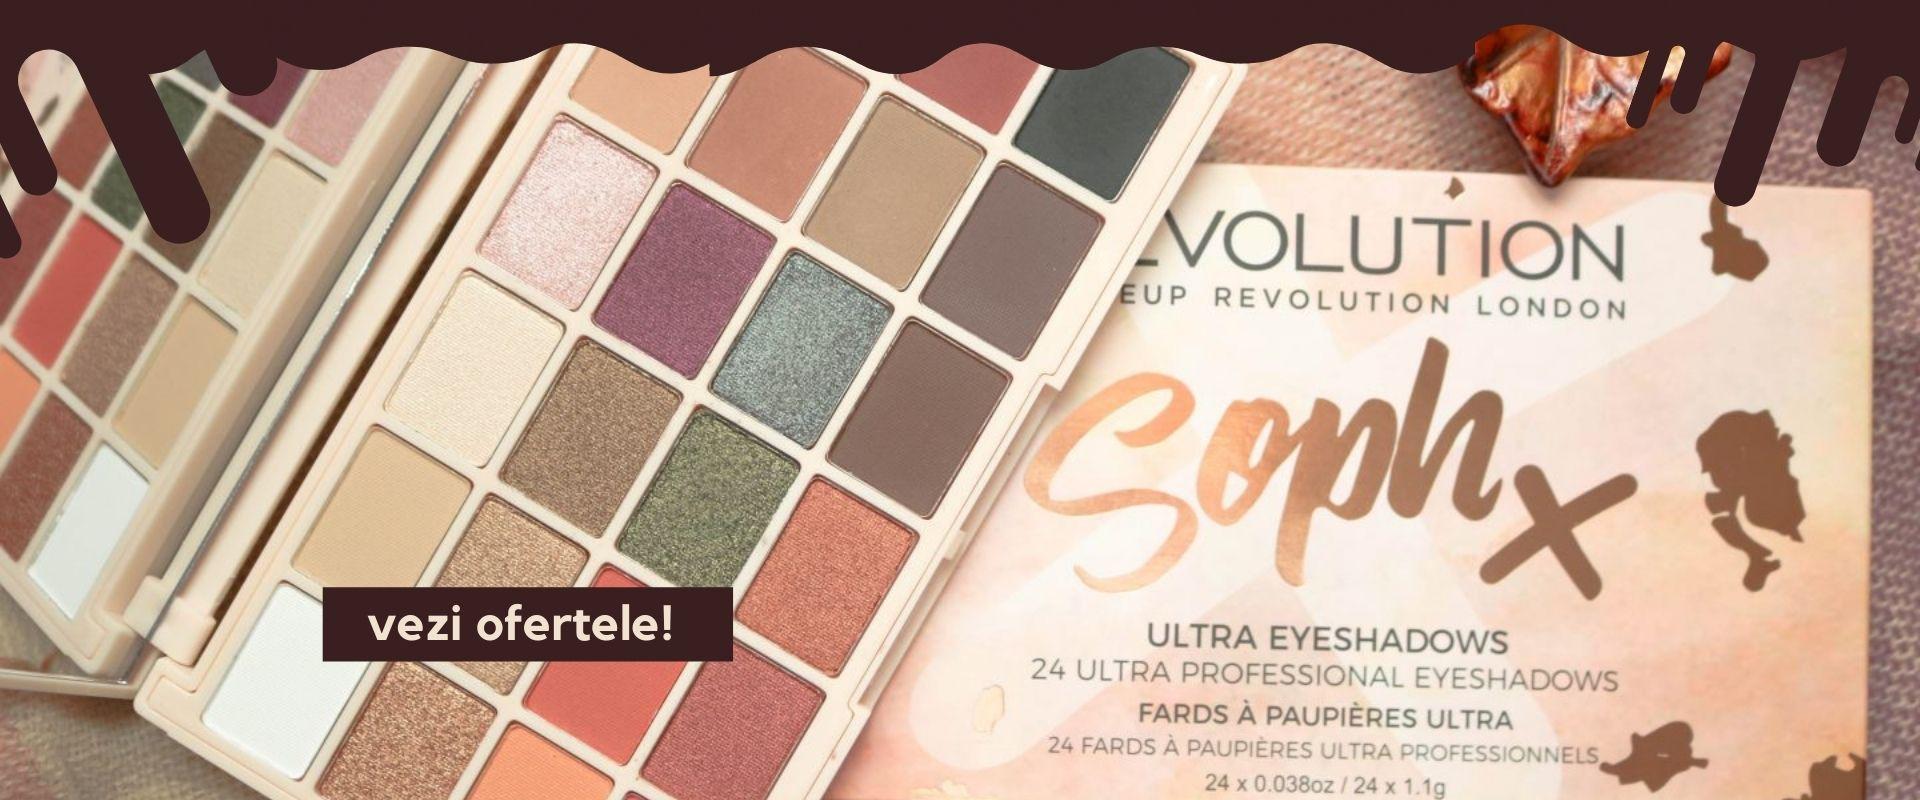 Produse cosmetice Makeup Revolution